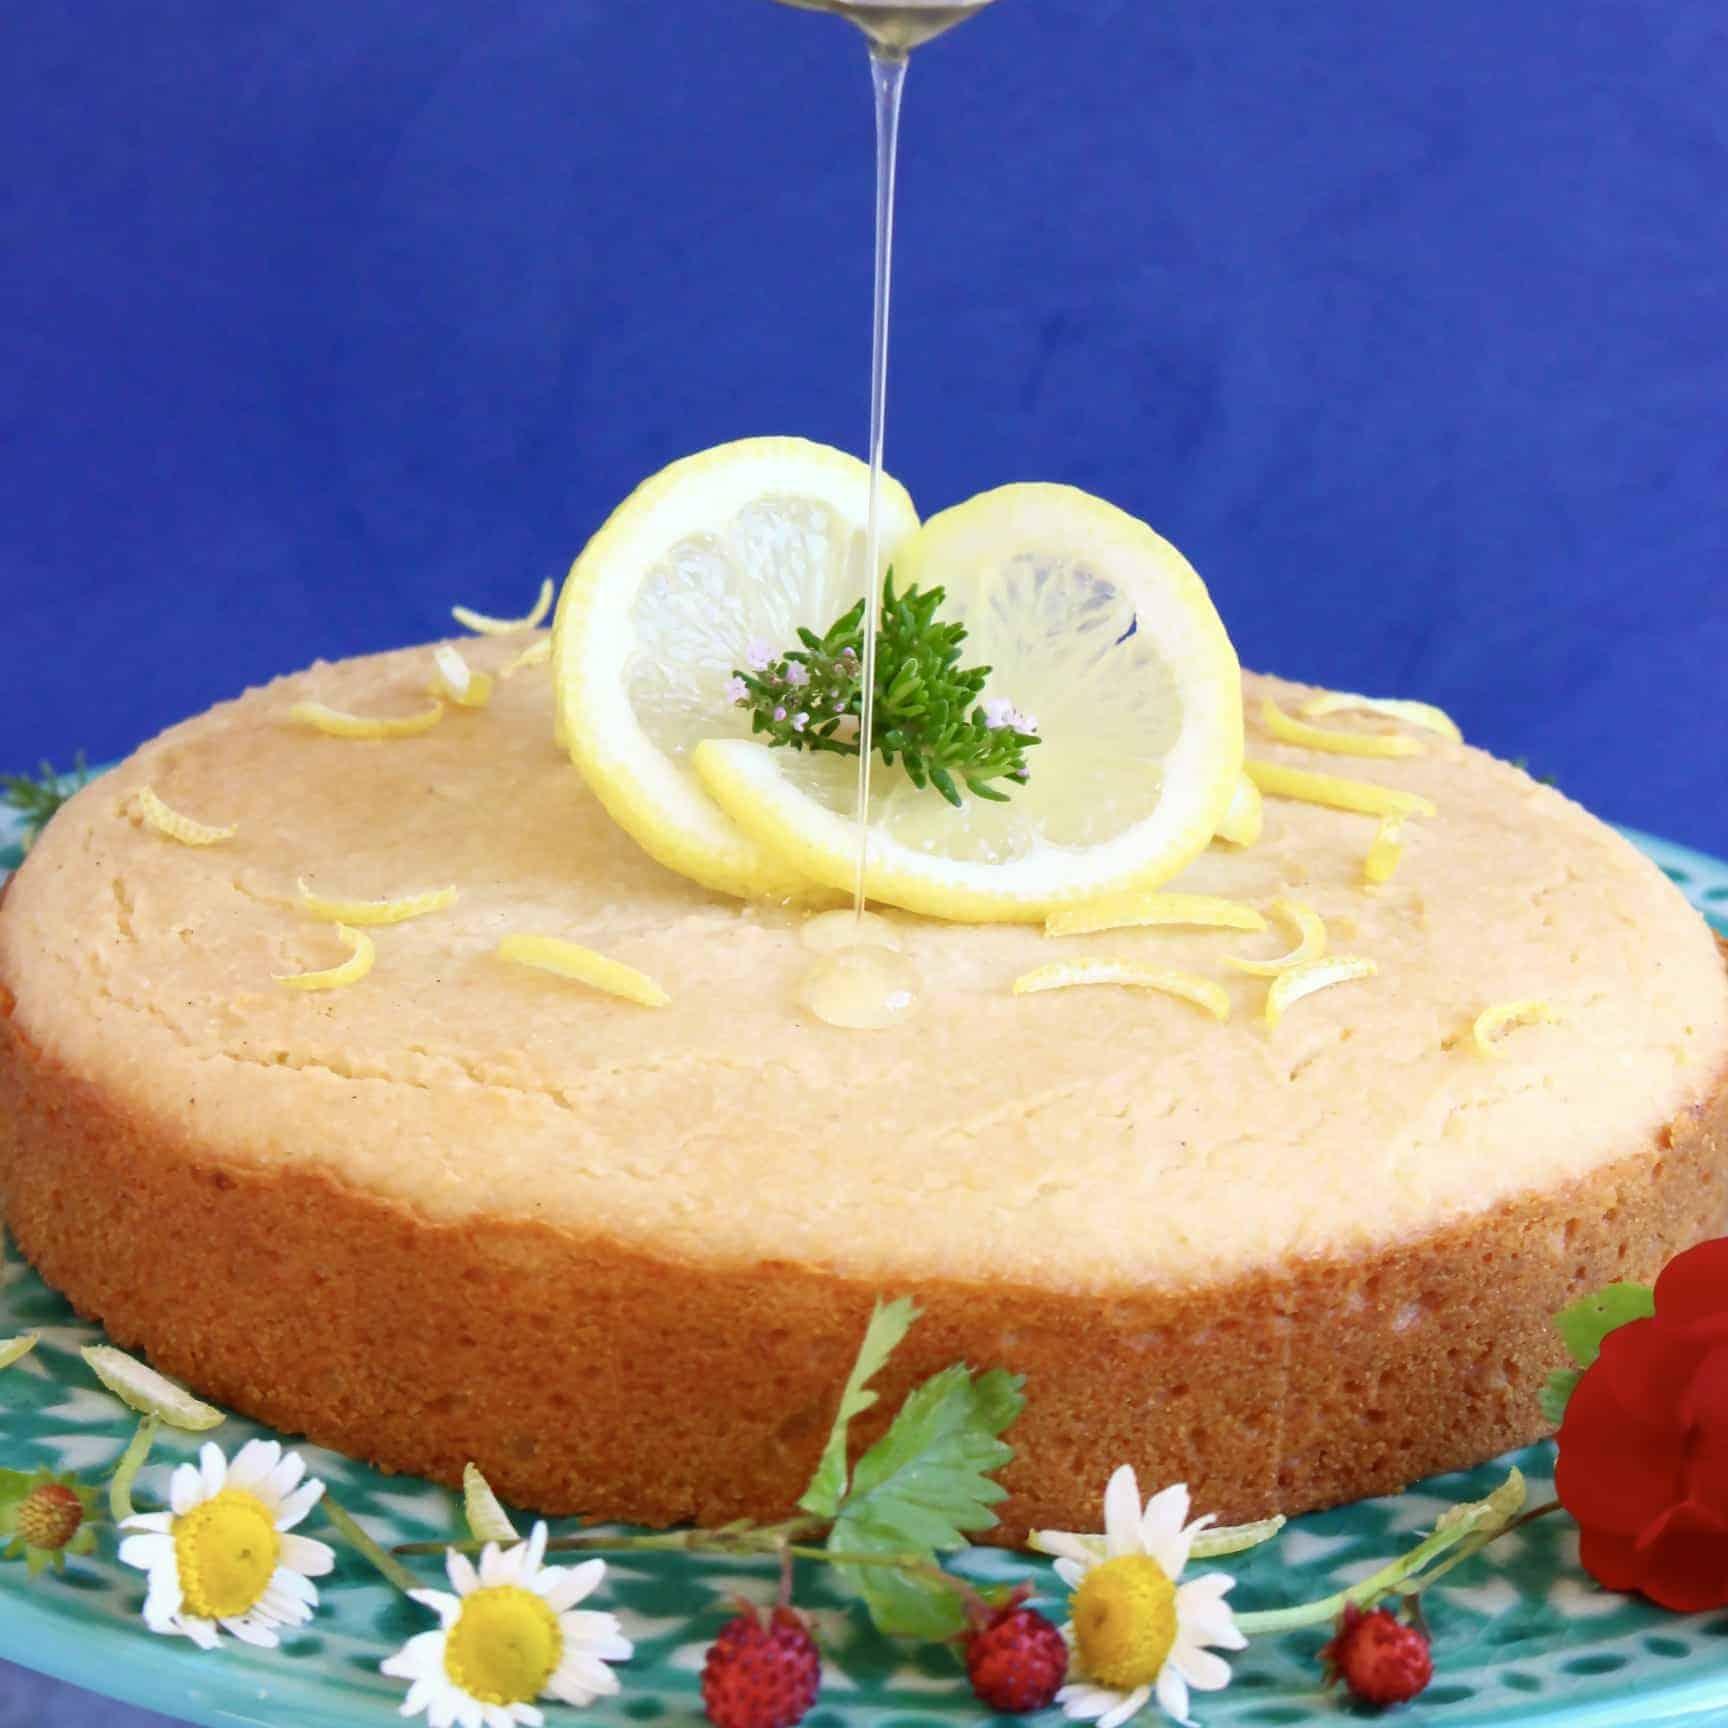 Gluten-Free Vegan Lemon Drizzle Cake